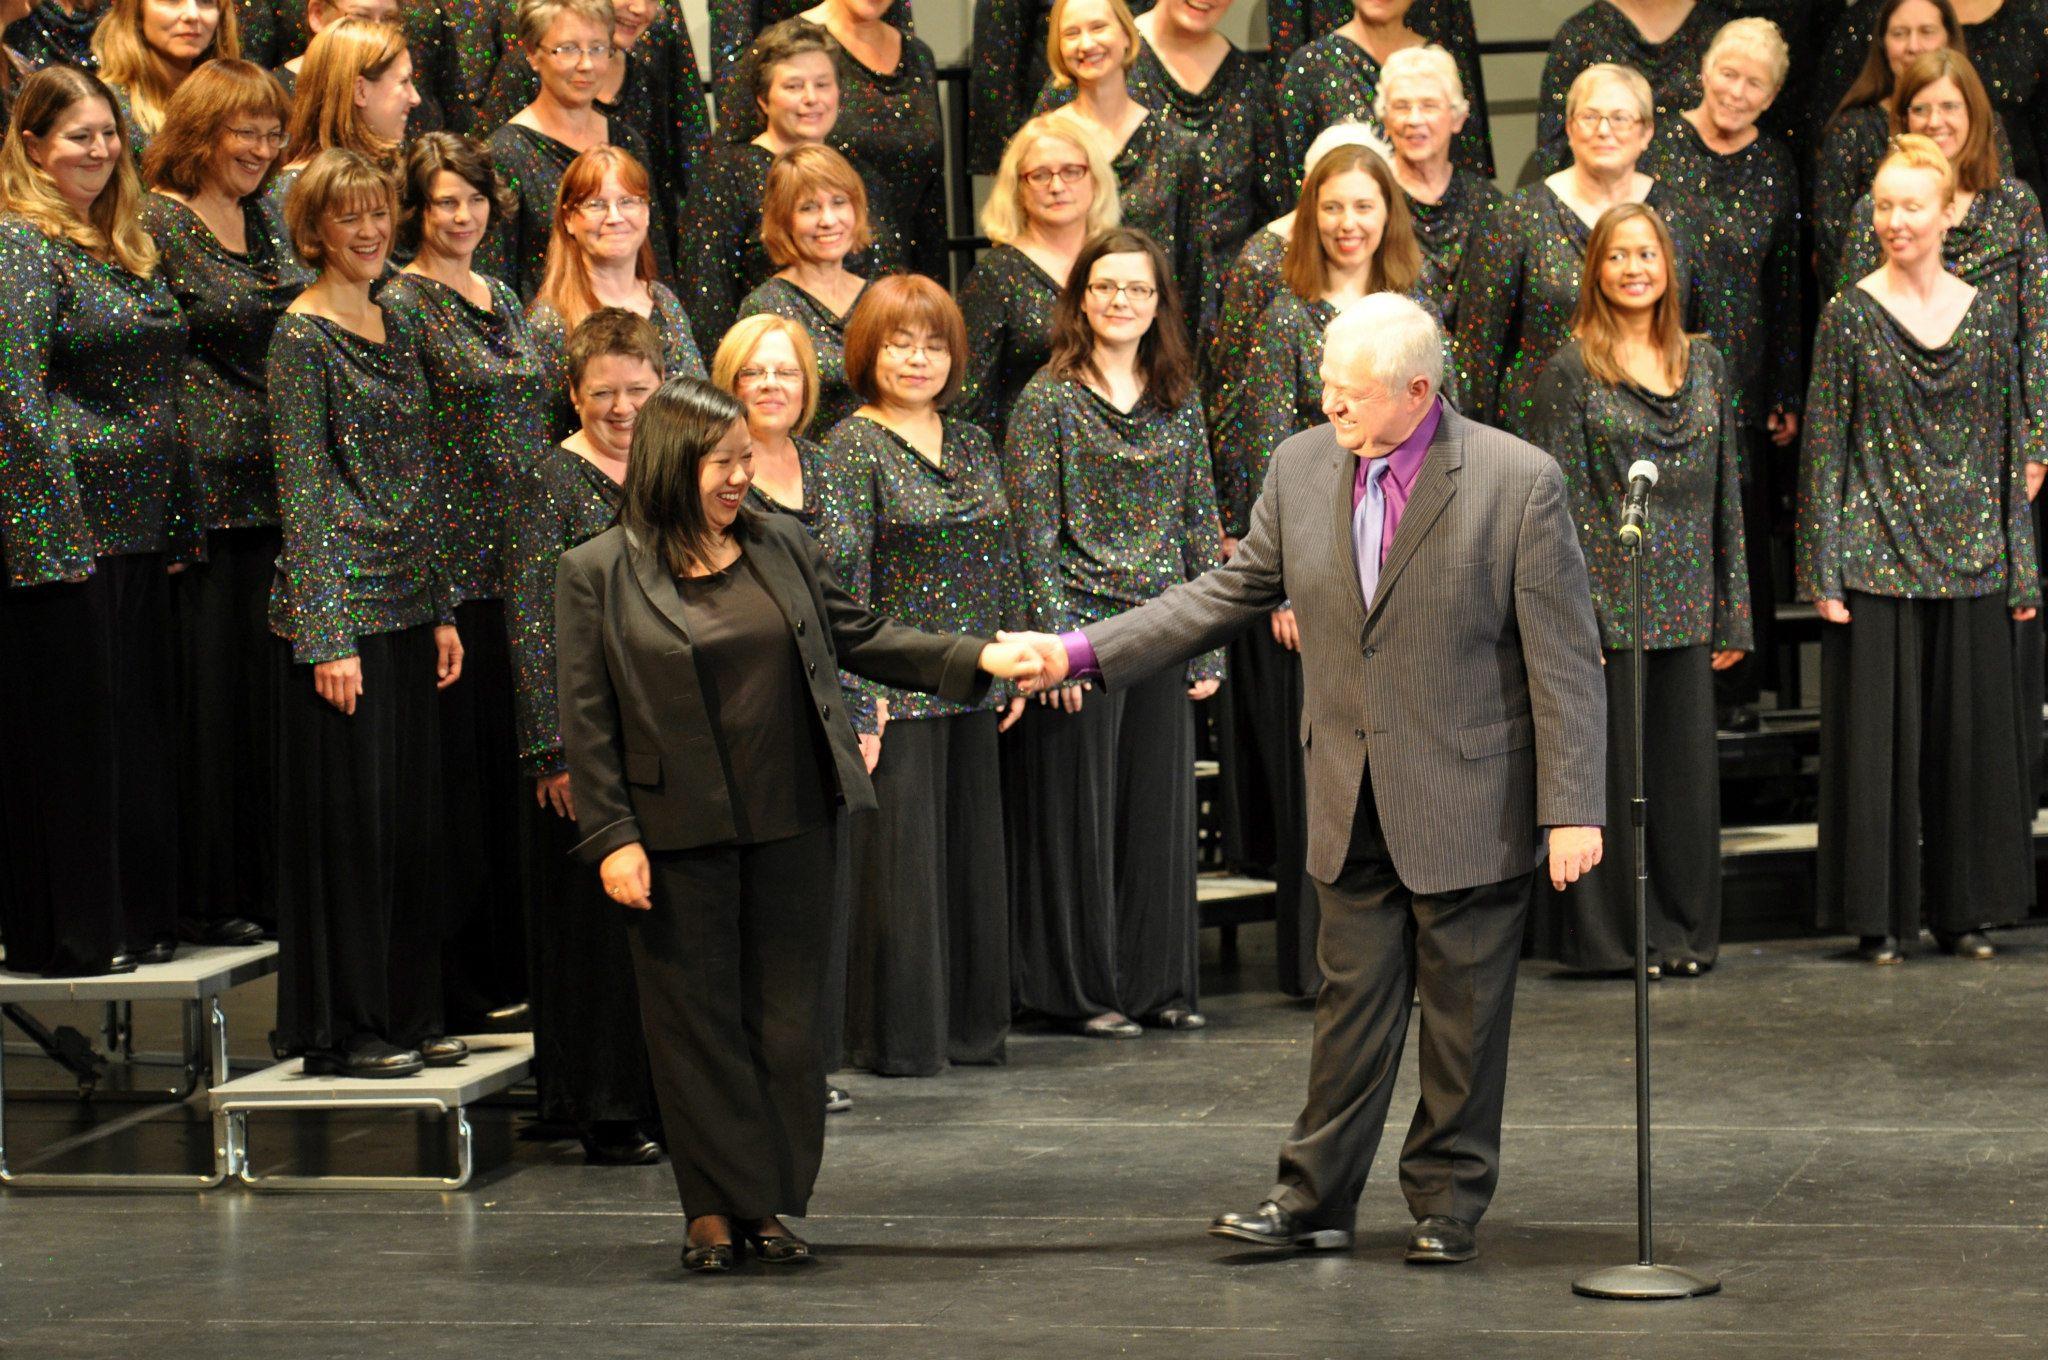 Dennis Coleman & Seattle Women's Chorus